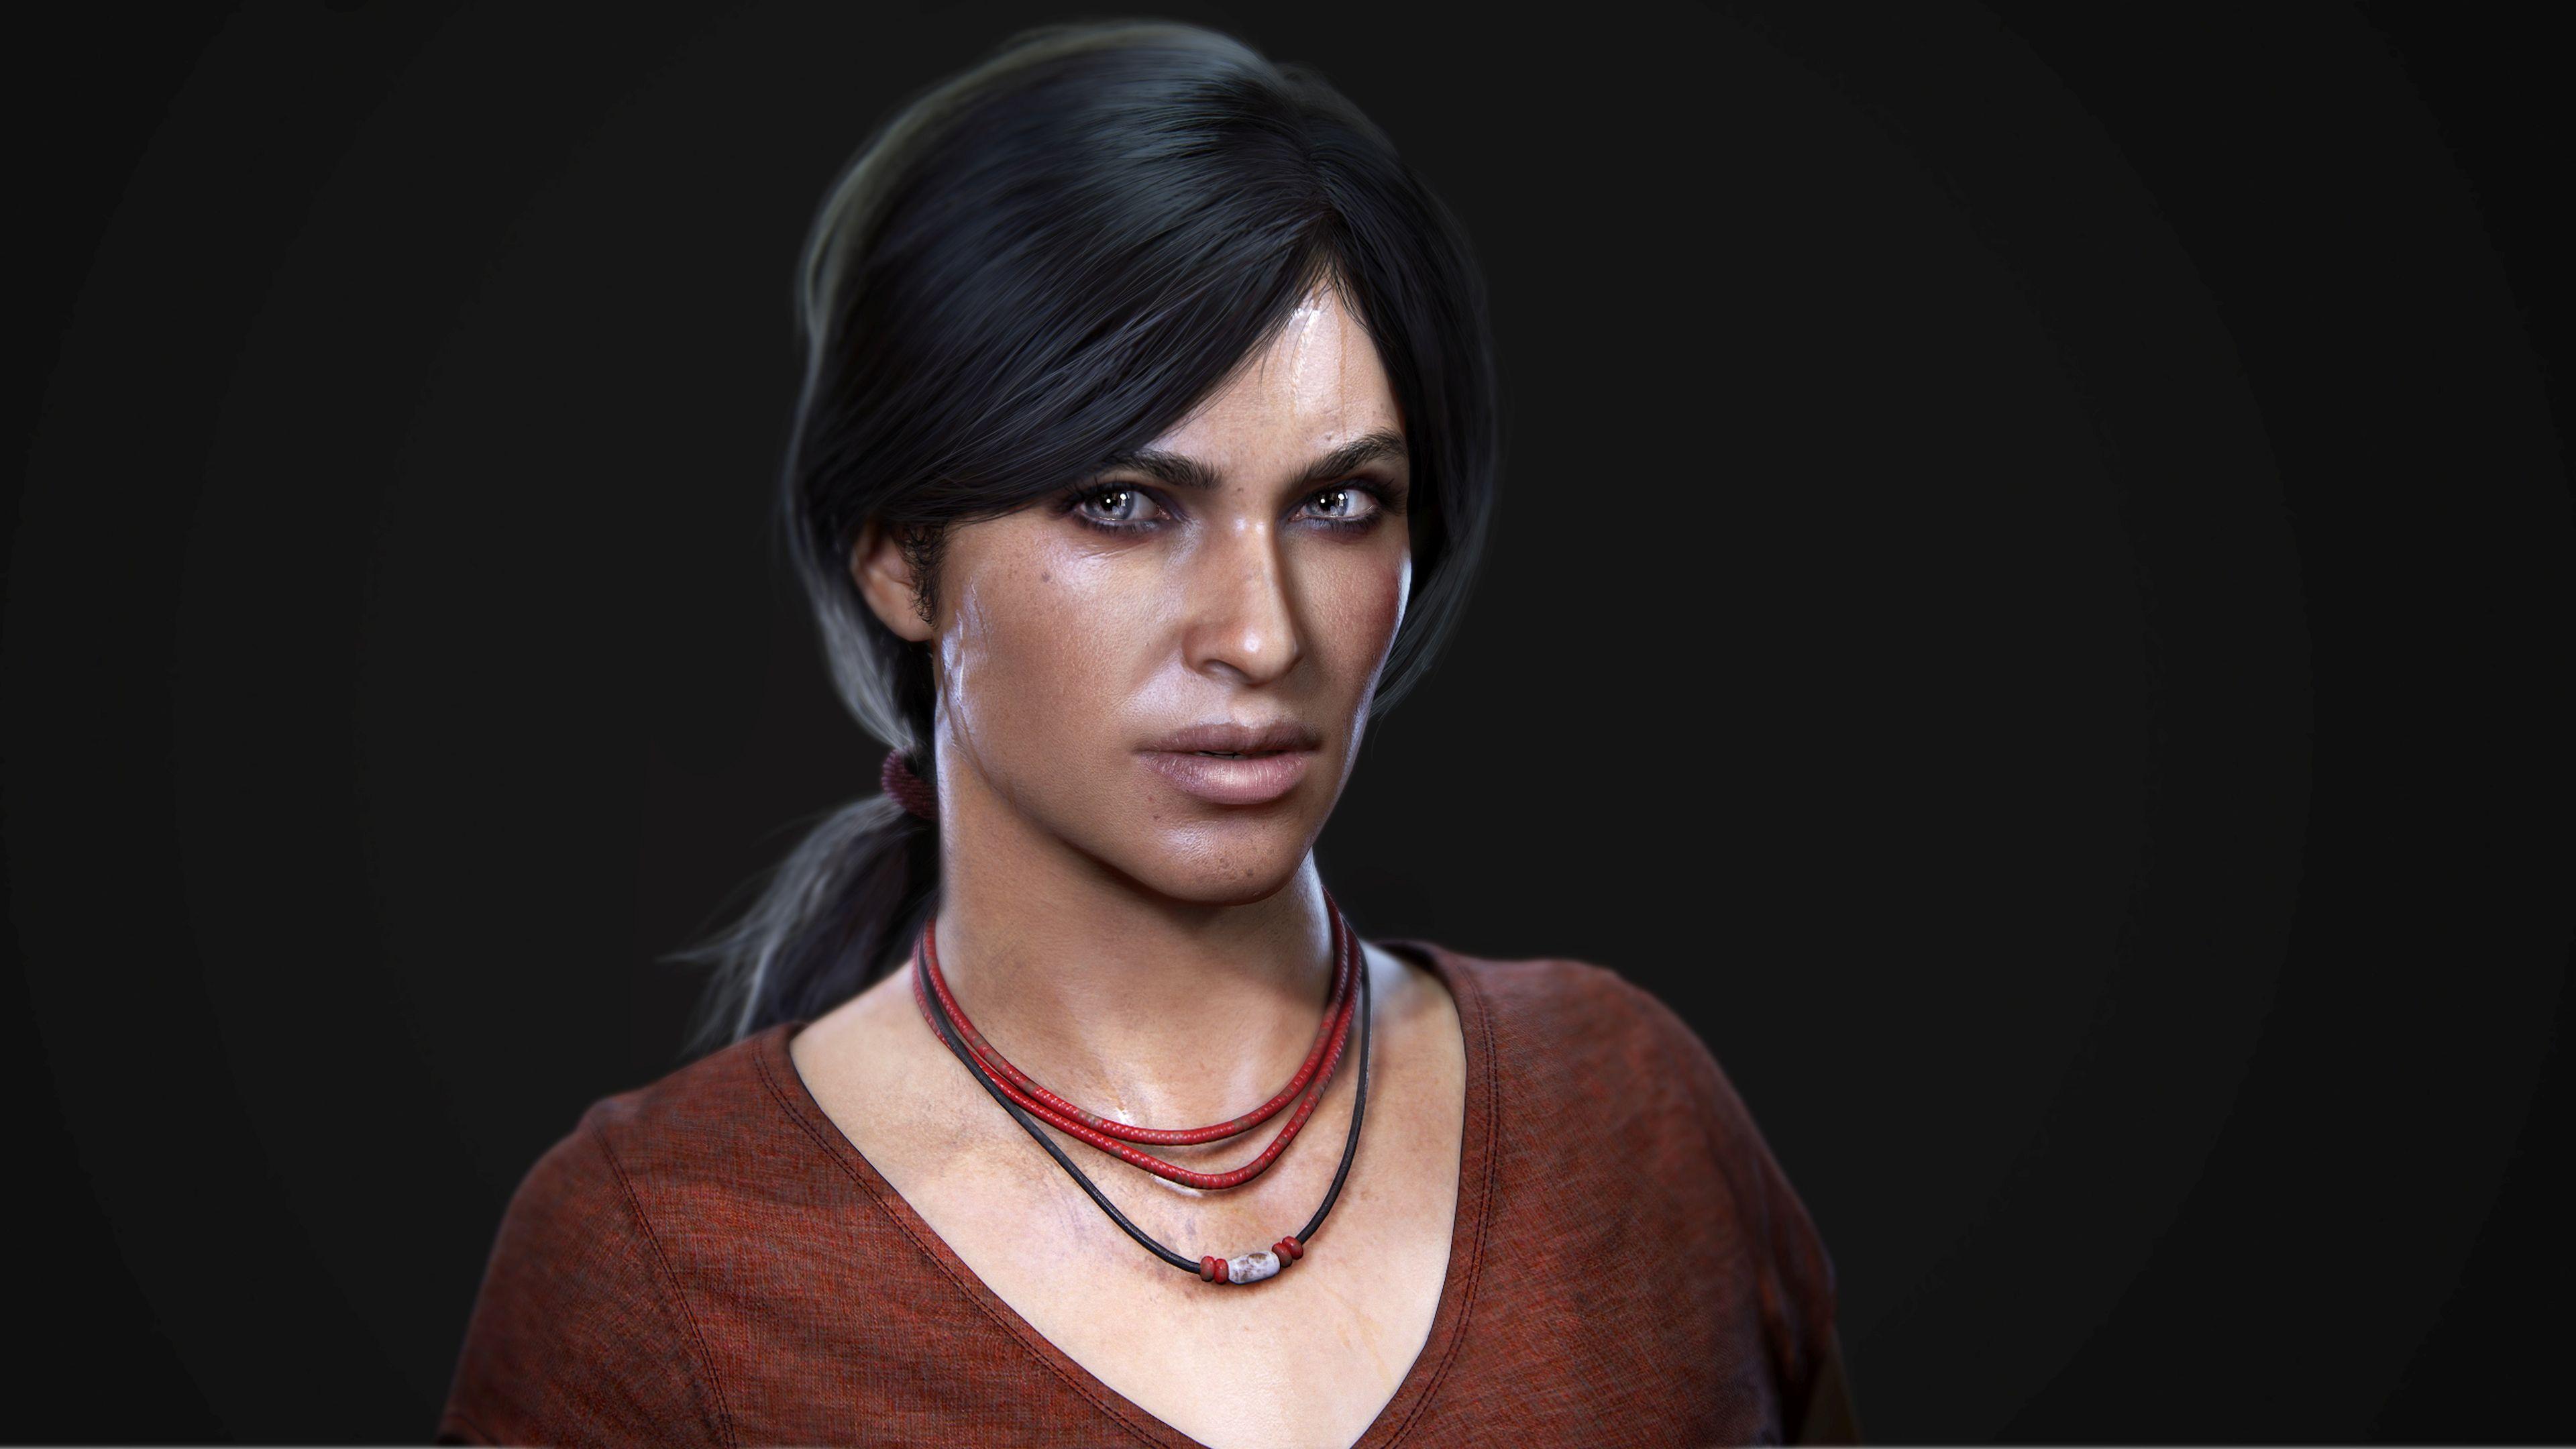 Chloe Frazer Uncharted The Lost Legacy Hd Jpg 3840 2160